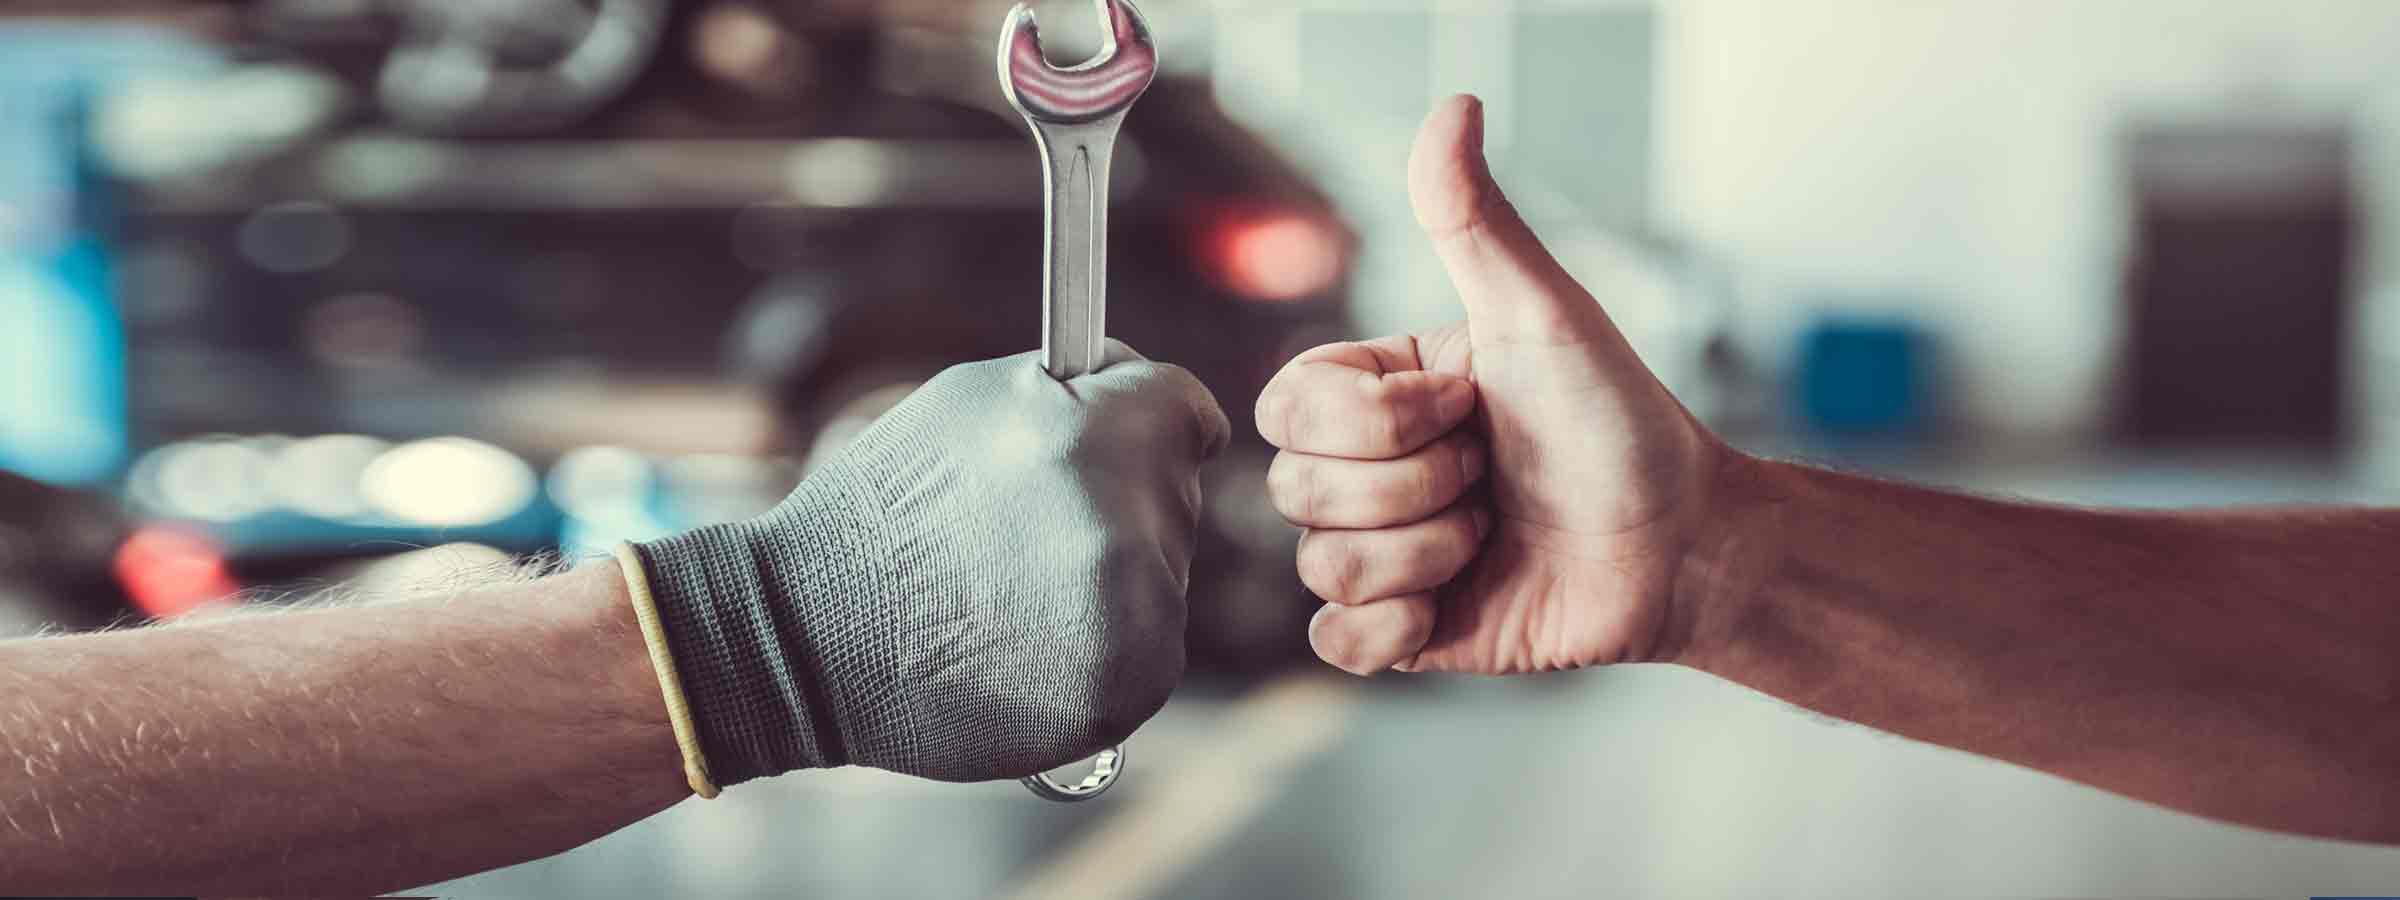 Automobilbranche - Offene Stellen / Jobs bei der Garage Galliker